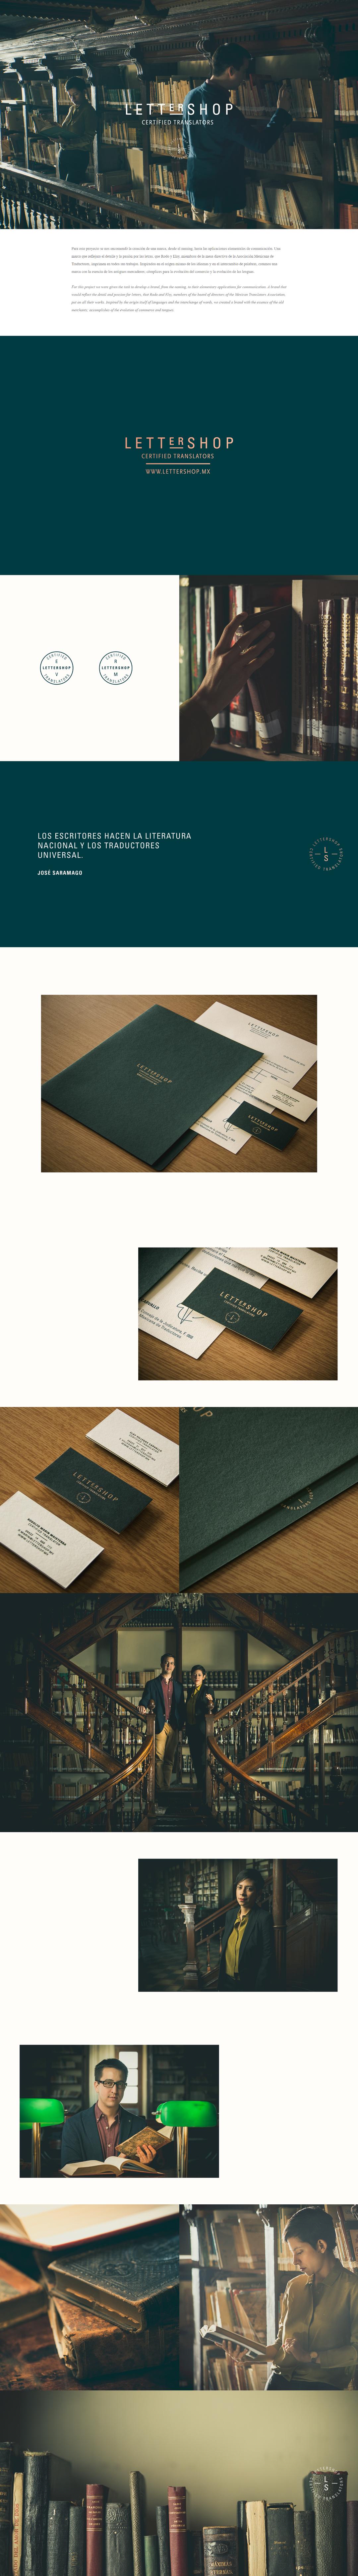 Graphic Design,Branding